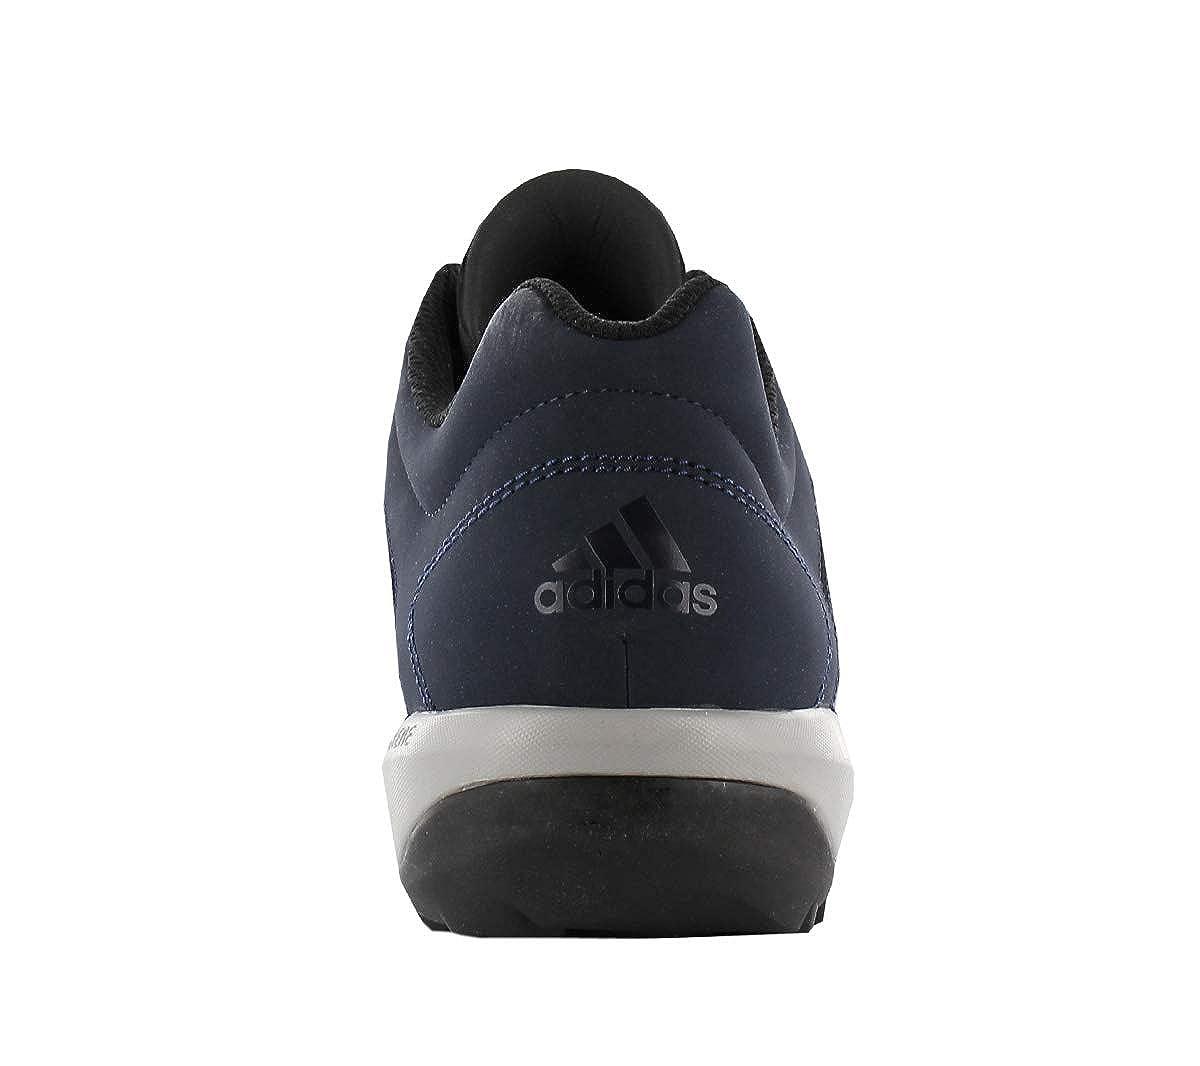 Adidas Daroga Plus Leather Herren Wanderschuhe Navy Blau